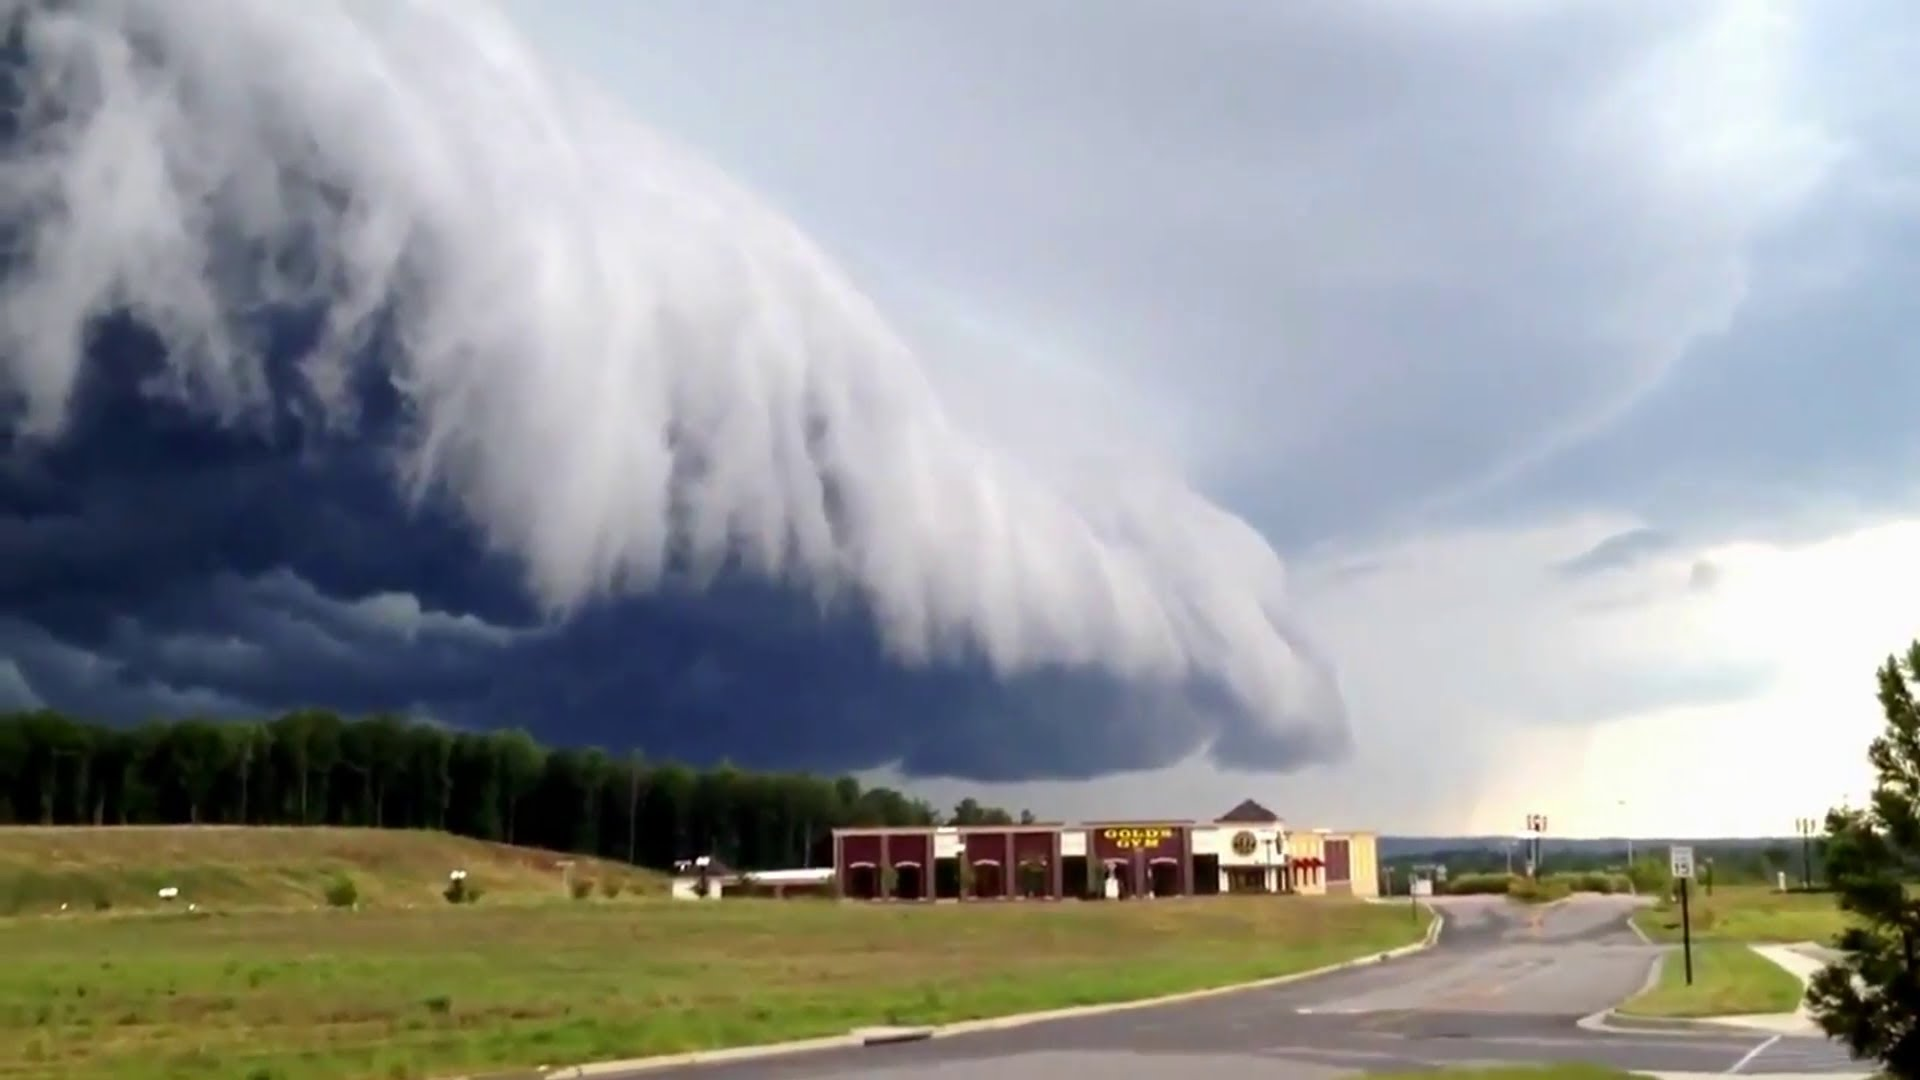 Amazing Ominous Upcoming Storm Cloud The Tango